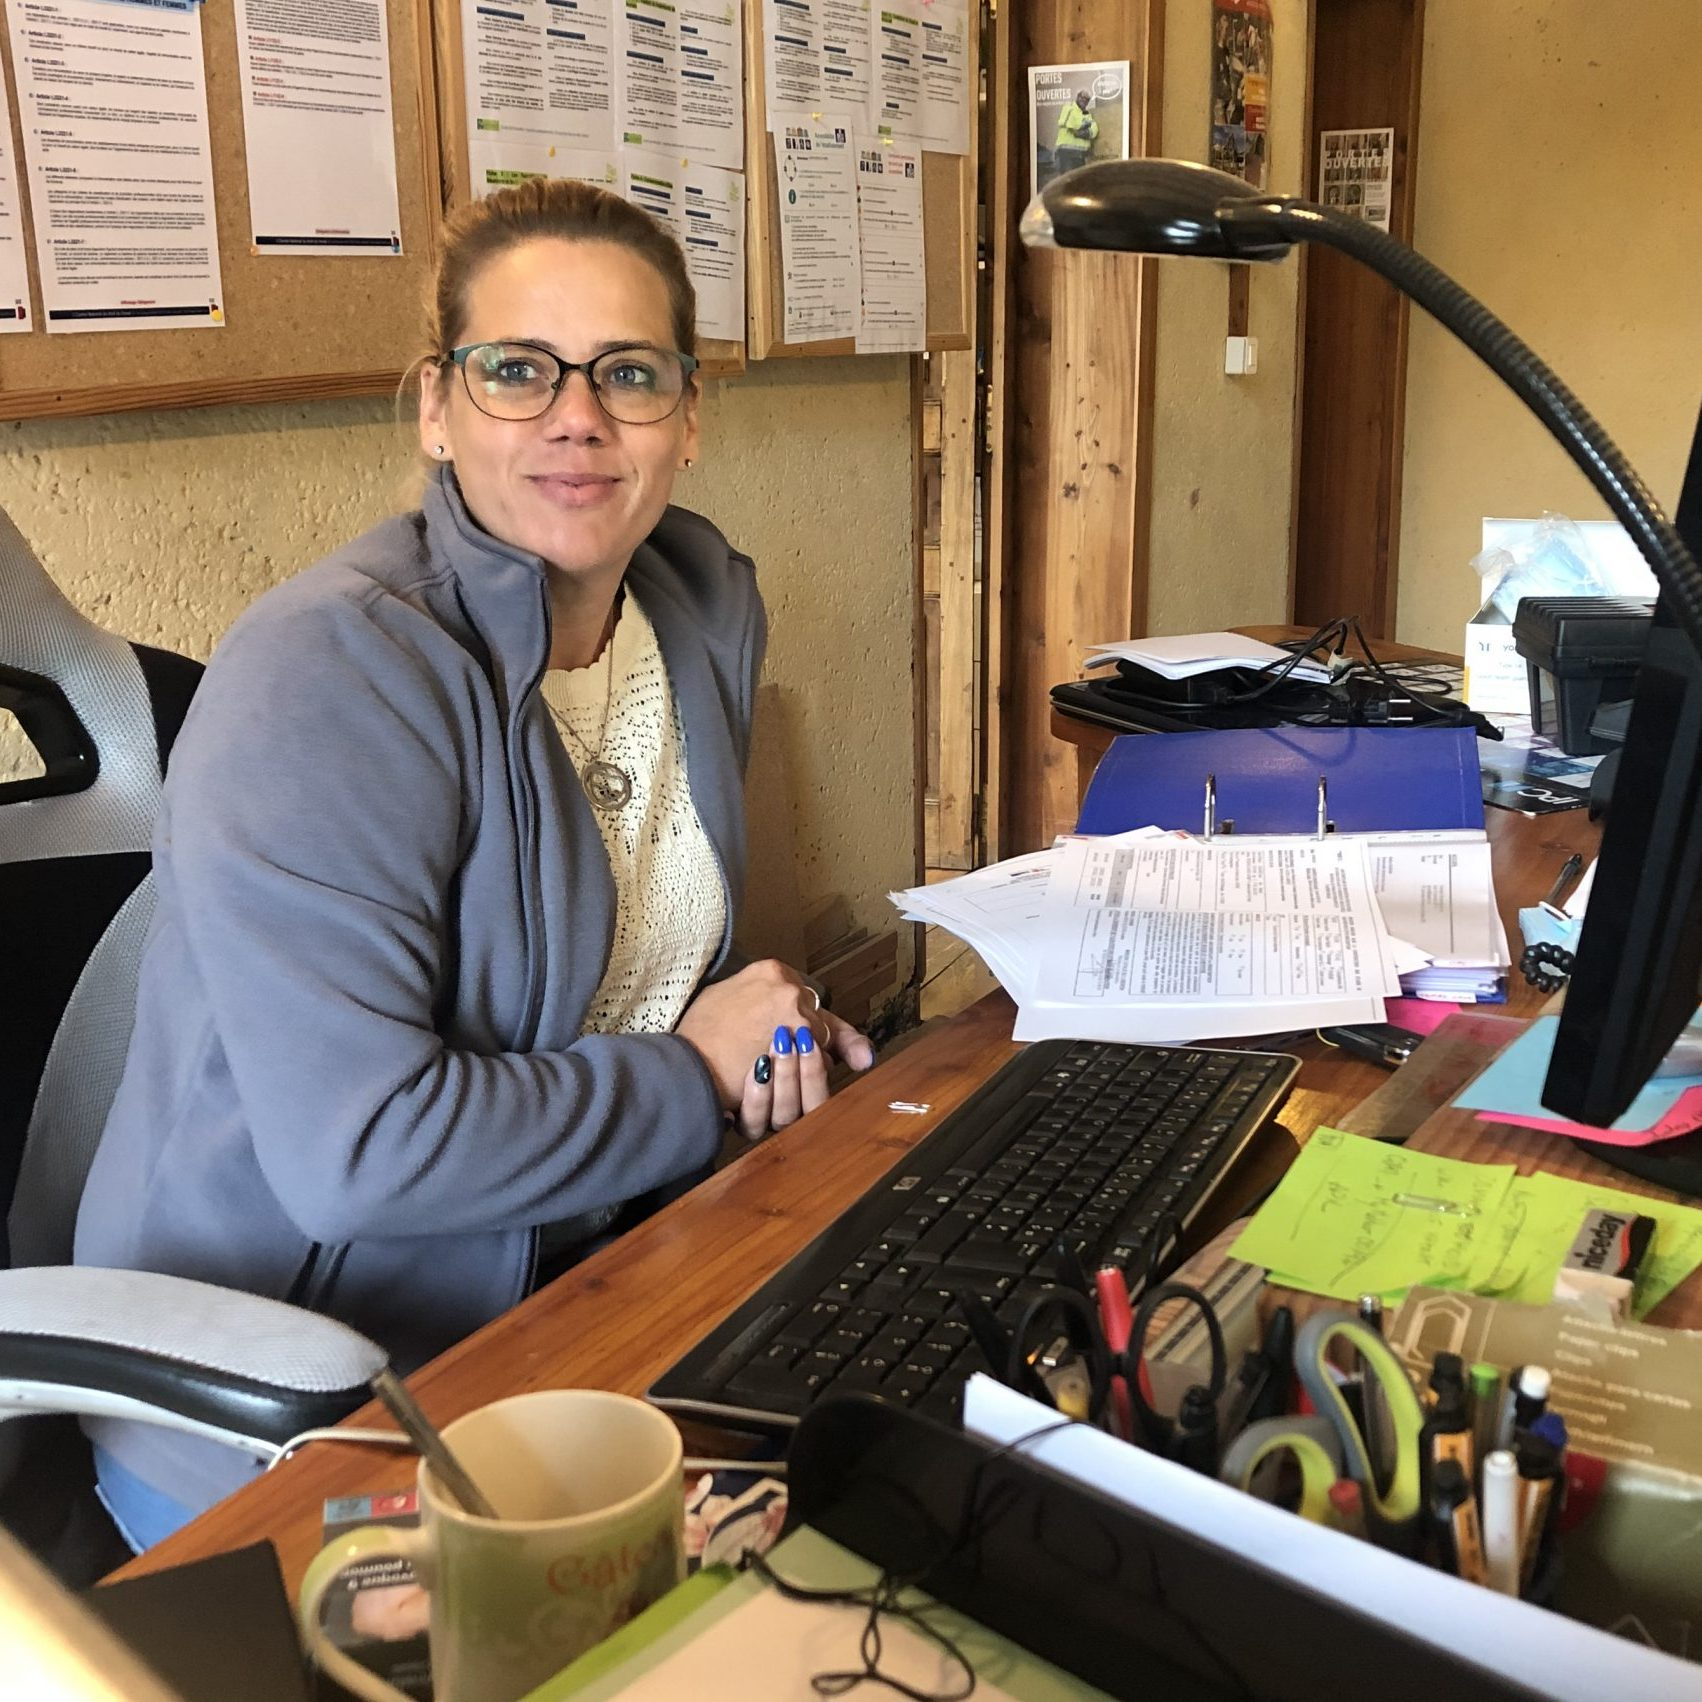 Stéphanie Fay - Administratif formation & insertion